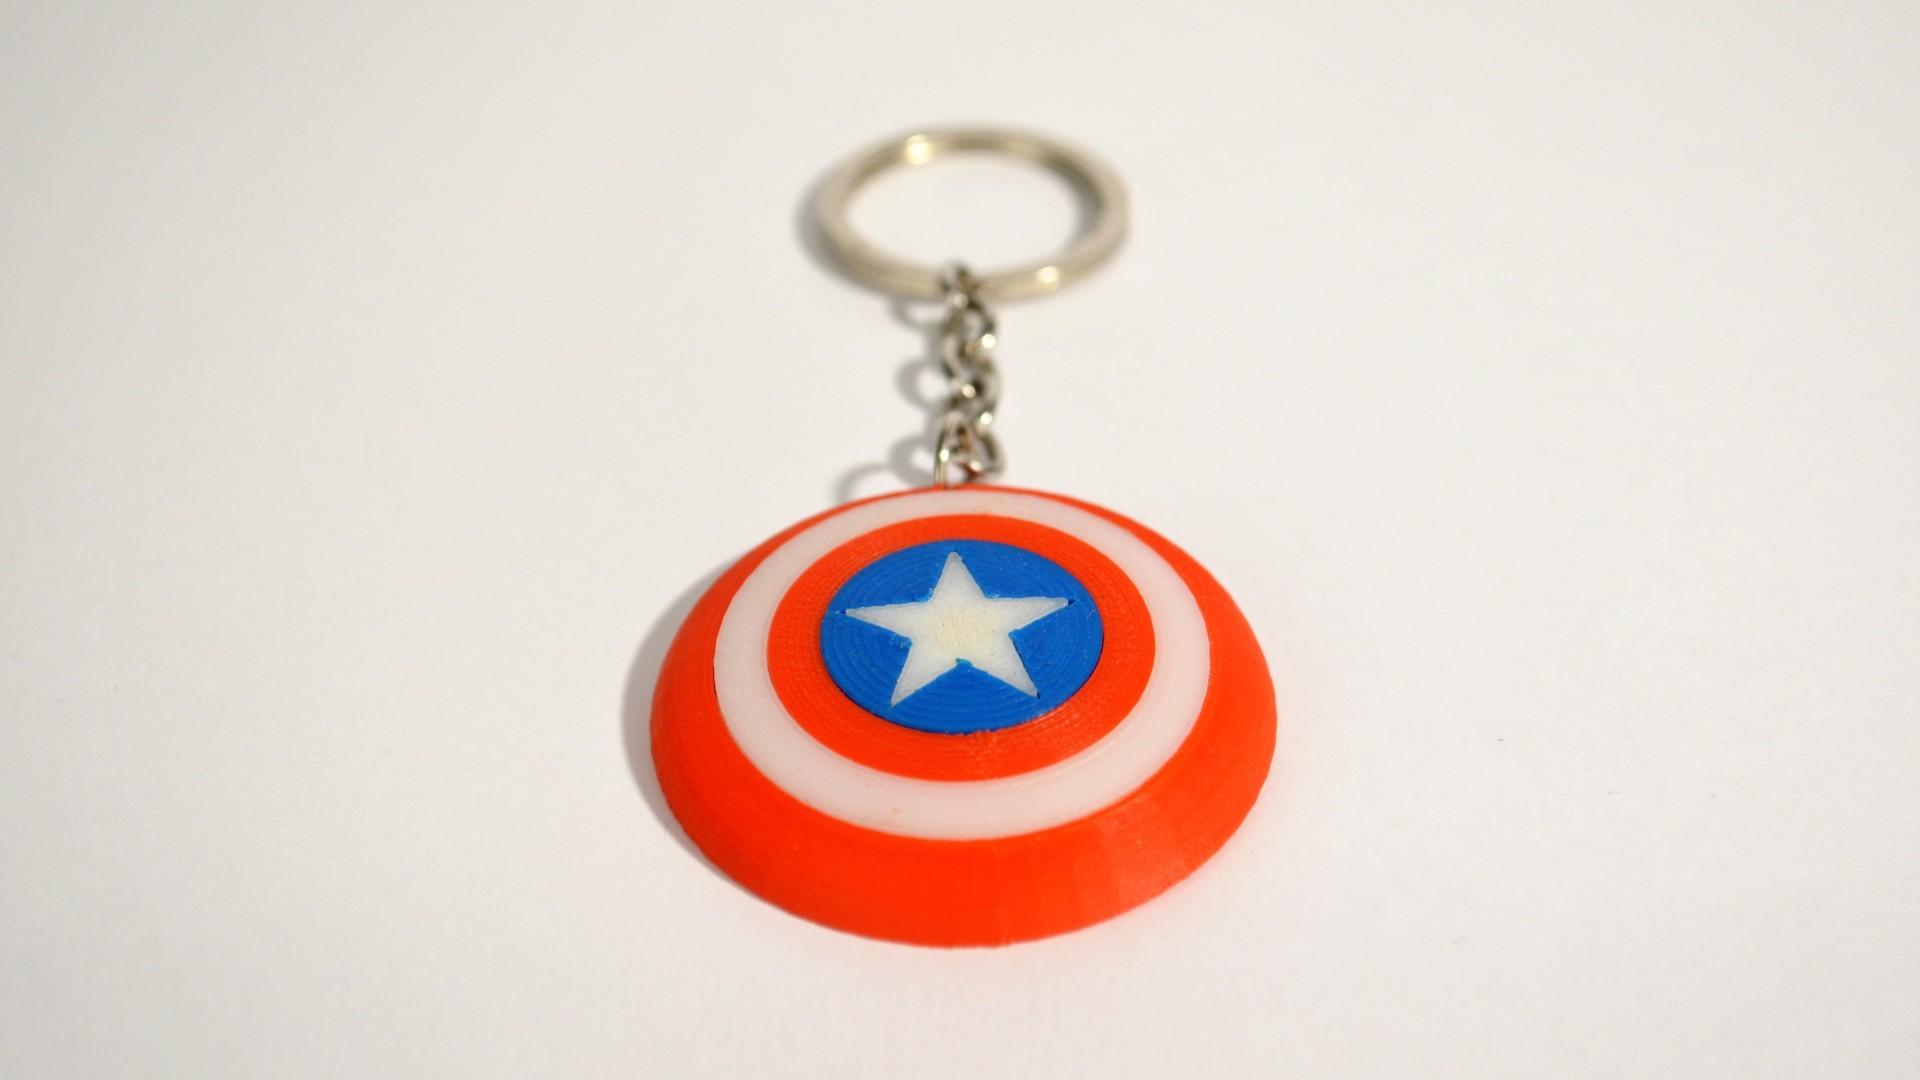 c_america2.jpg Download free STL file Captain America Shield Keychain • 3D printable model, 2be3d